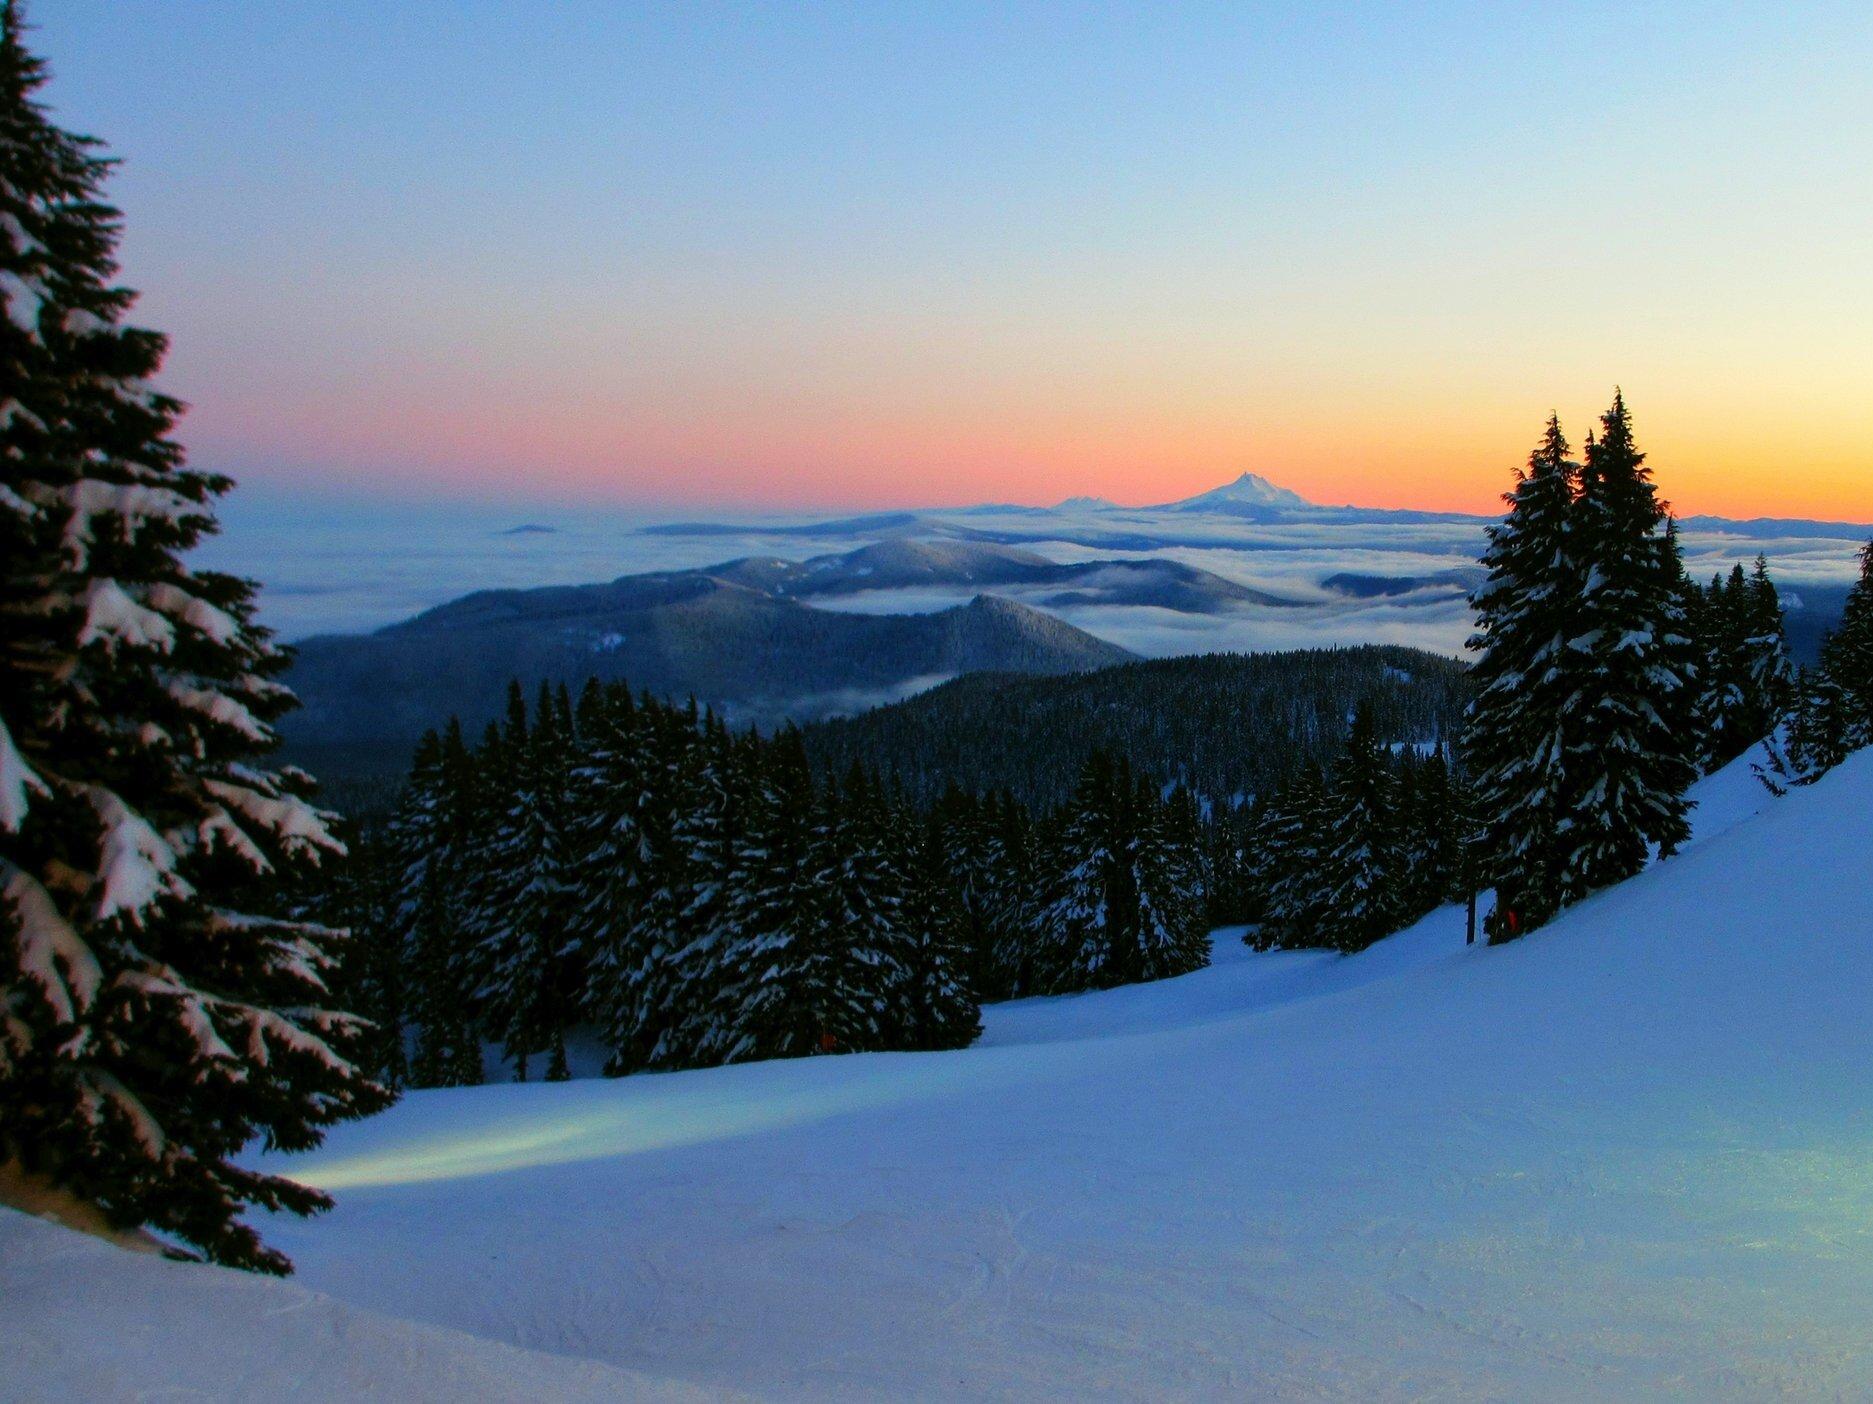 Oregon Bucket List - Best Places To Visit in Oregon